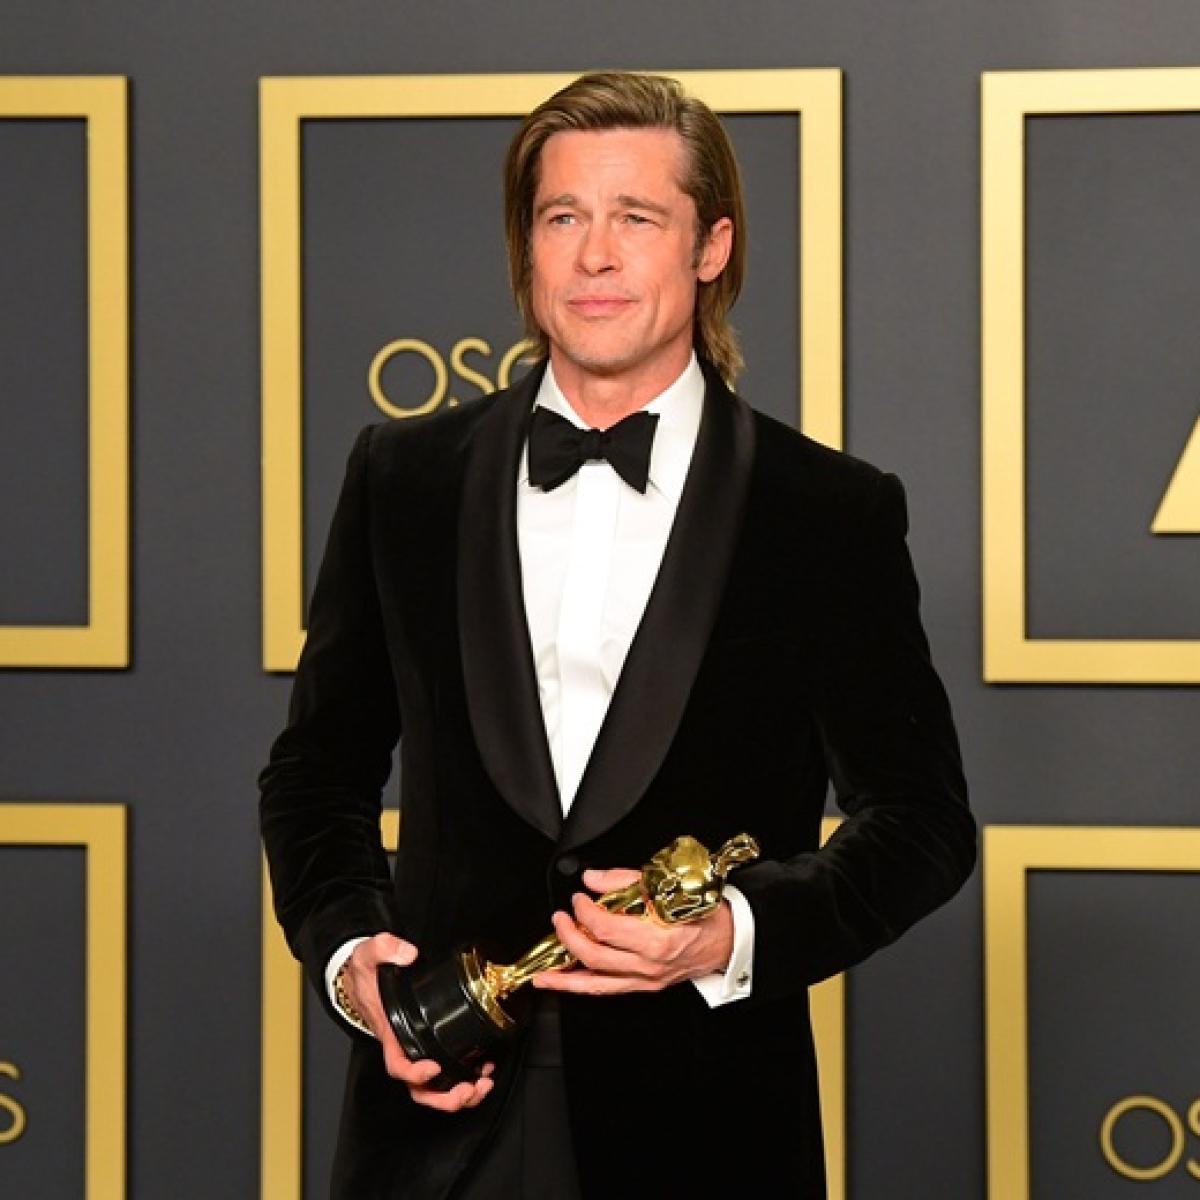 After 33 years, Brad Pitt wins maiden acting Oscar